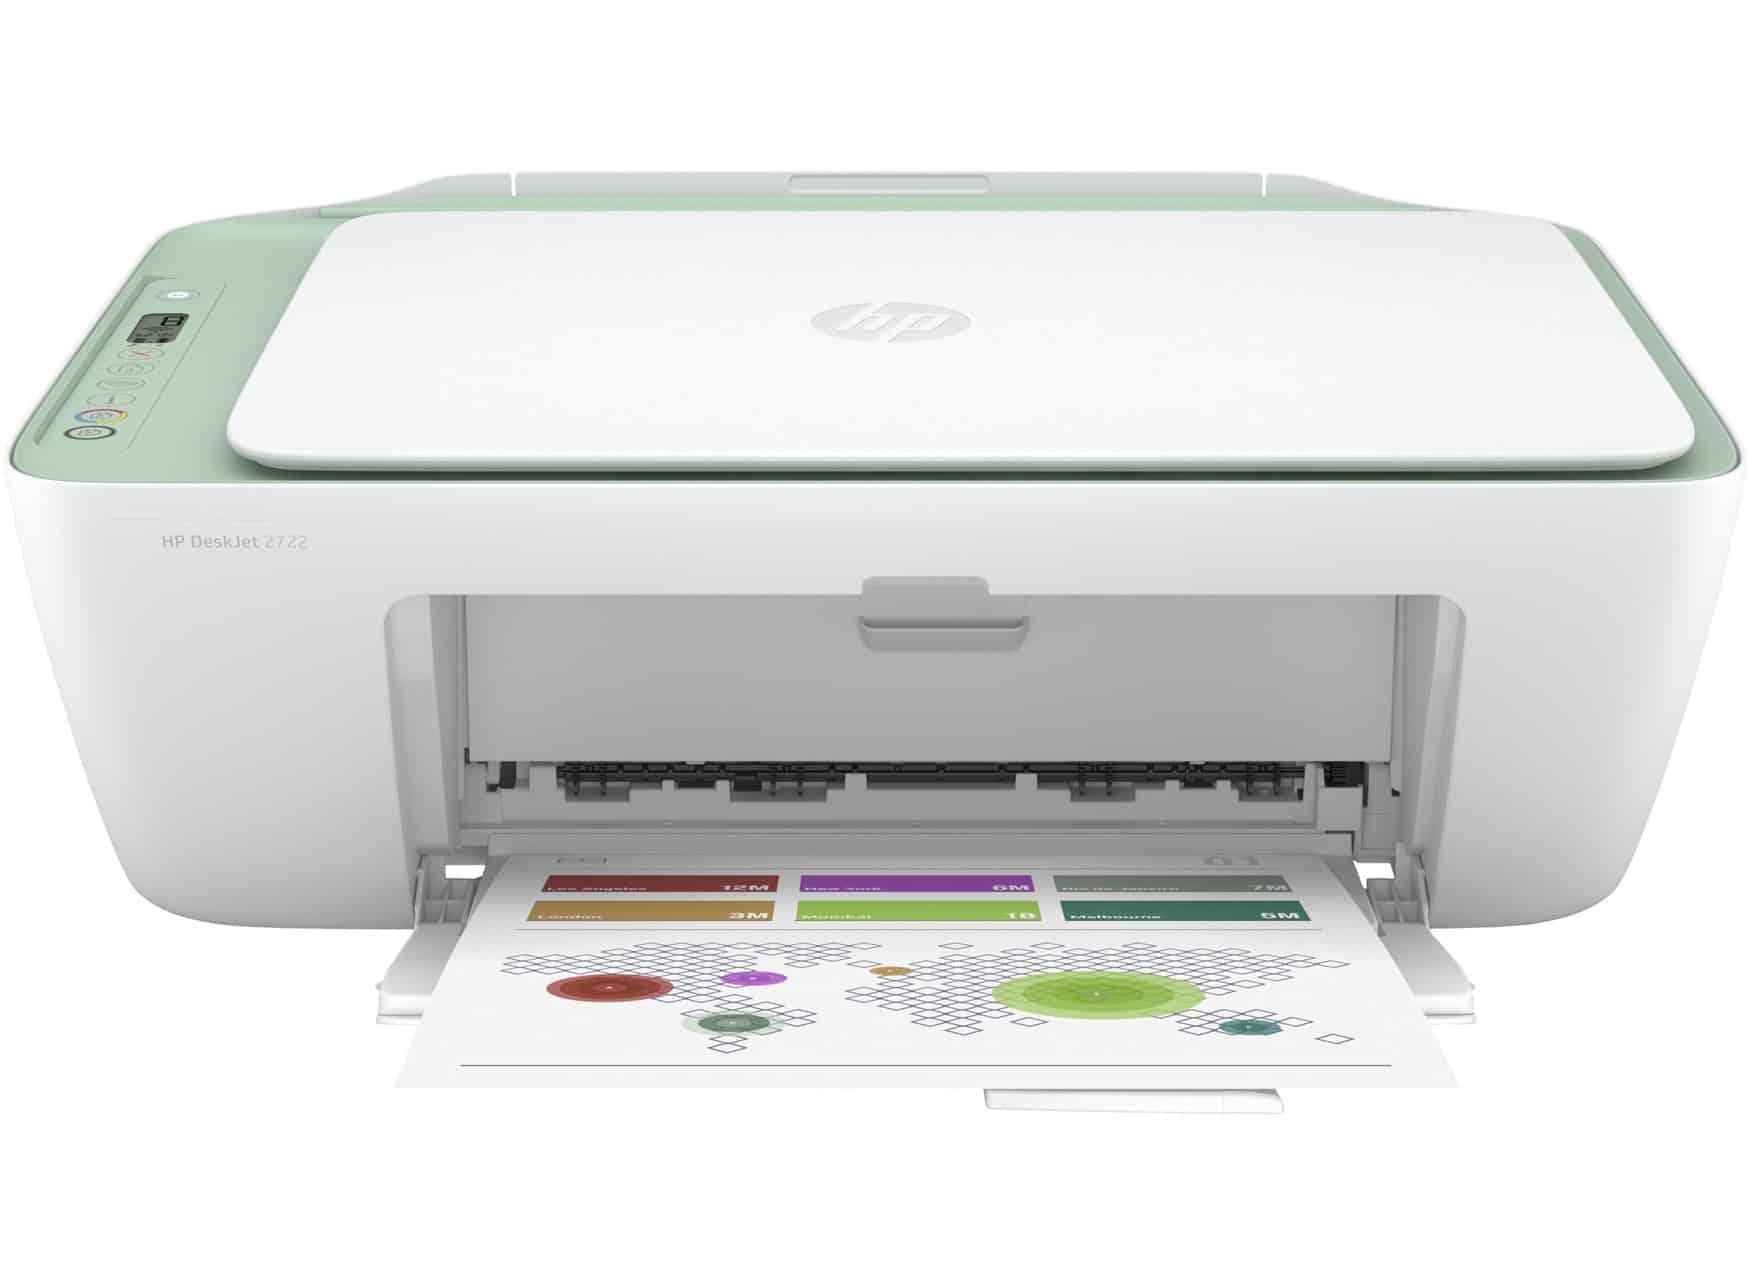 HP DeskJet 2722 corte ingles